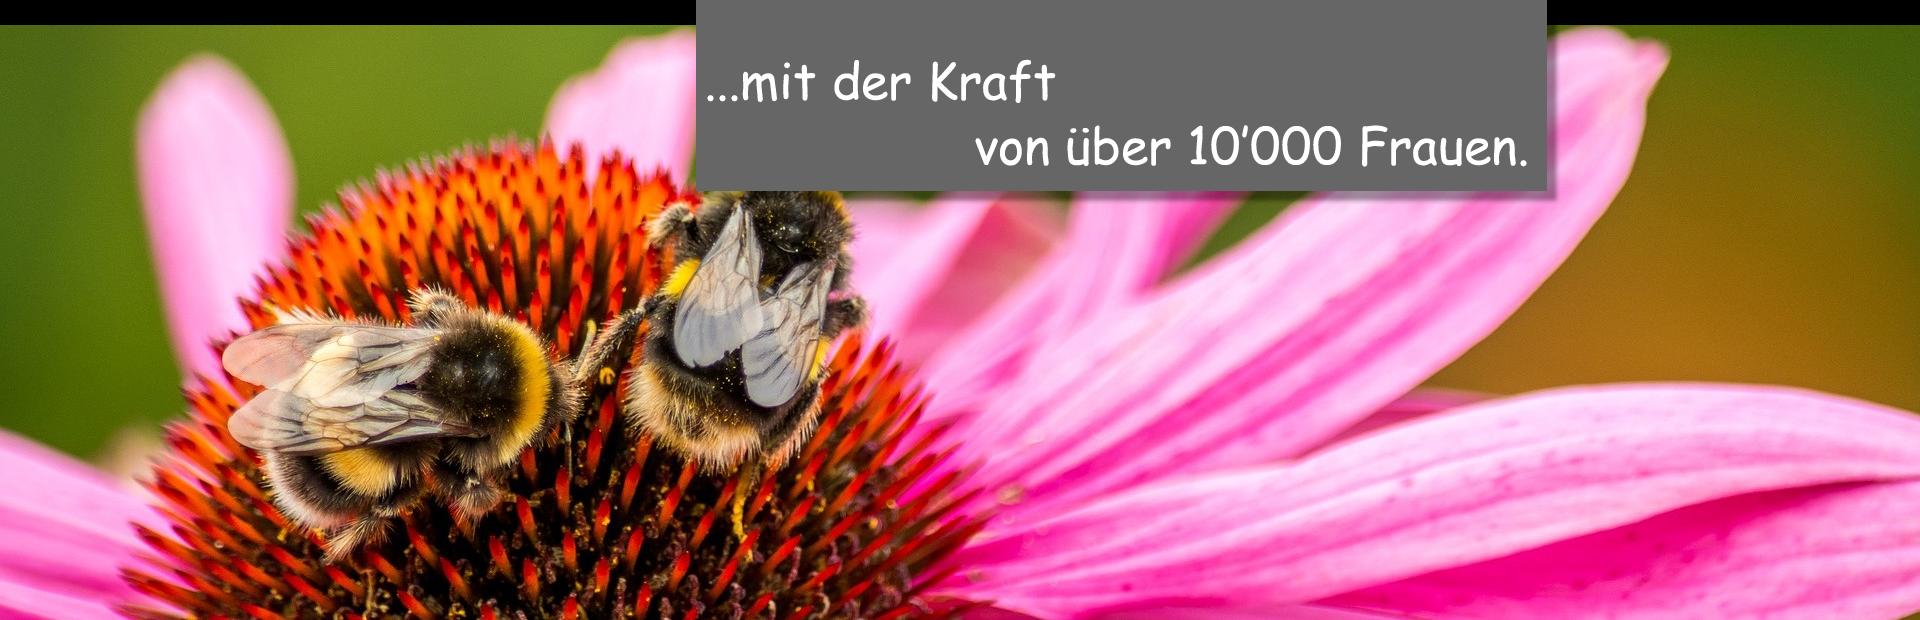 Hummel2_Kraft